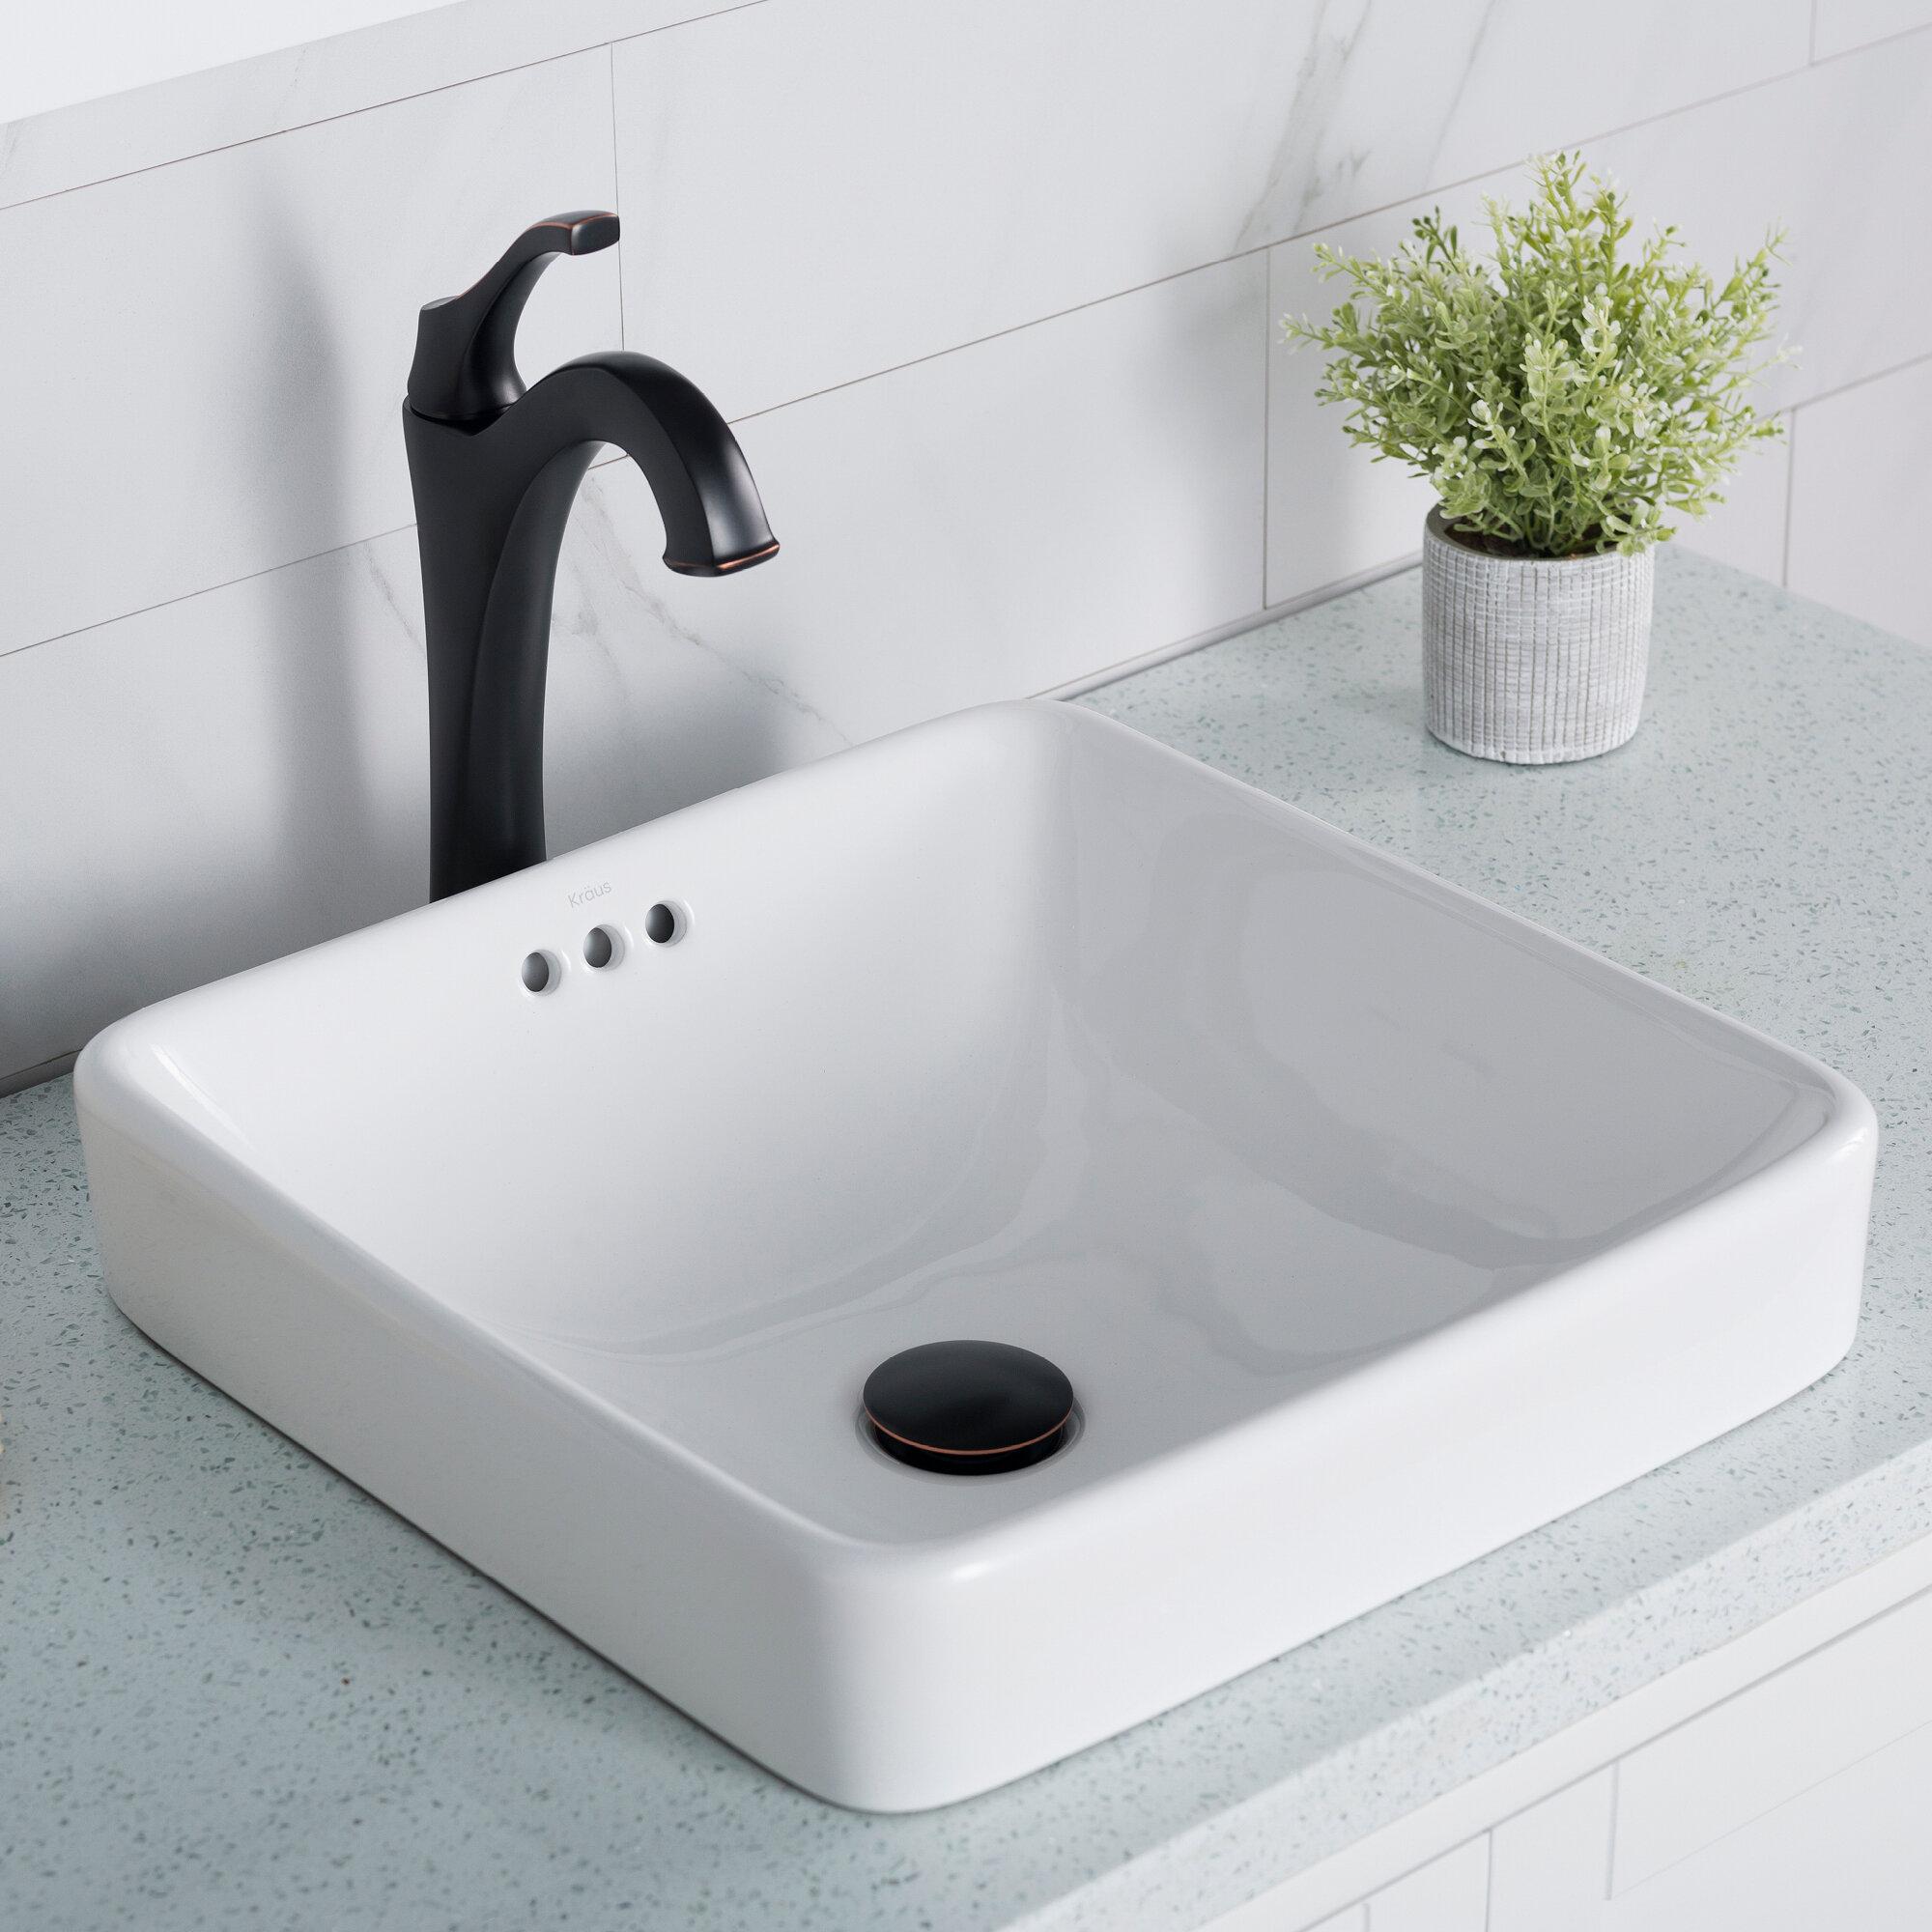 KCR-281 Kraus Elavo Ceramic Square Semi-Recessed Bathroom Sink with Overflow & Reviews | Wayfair